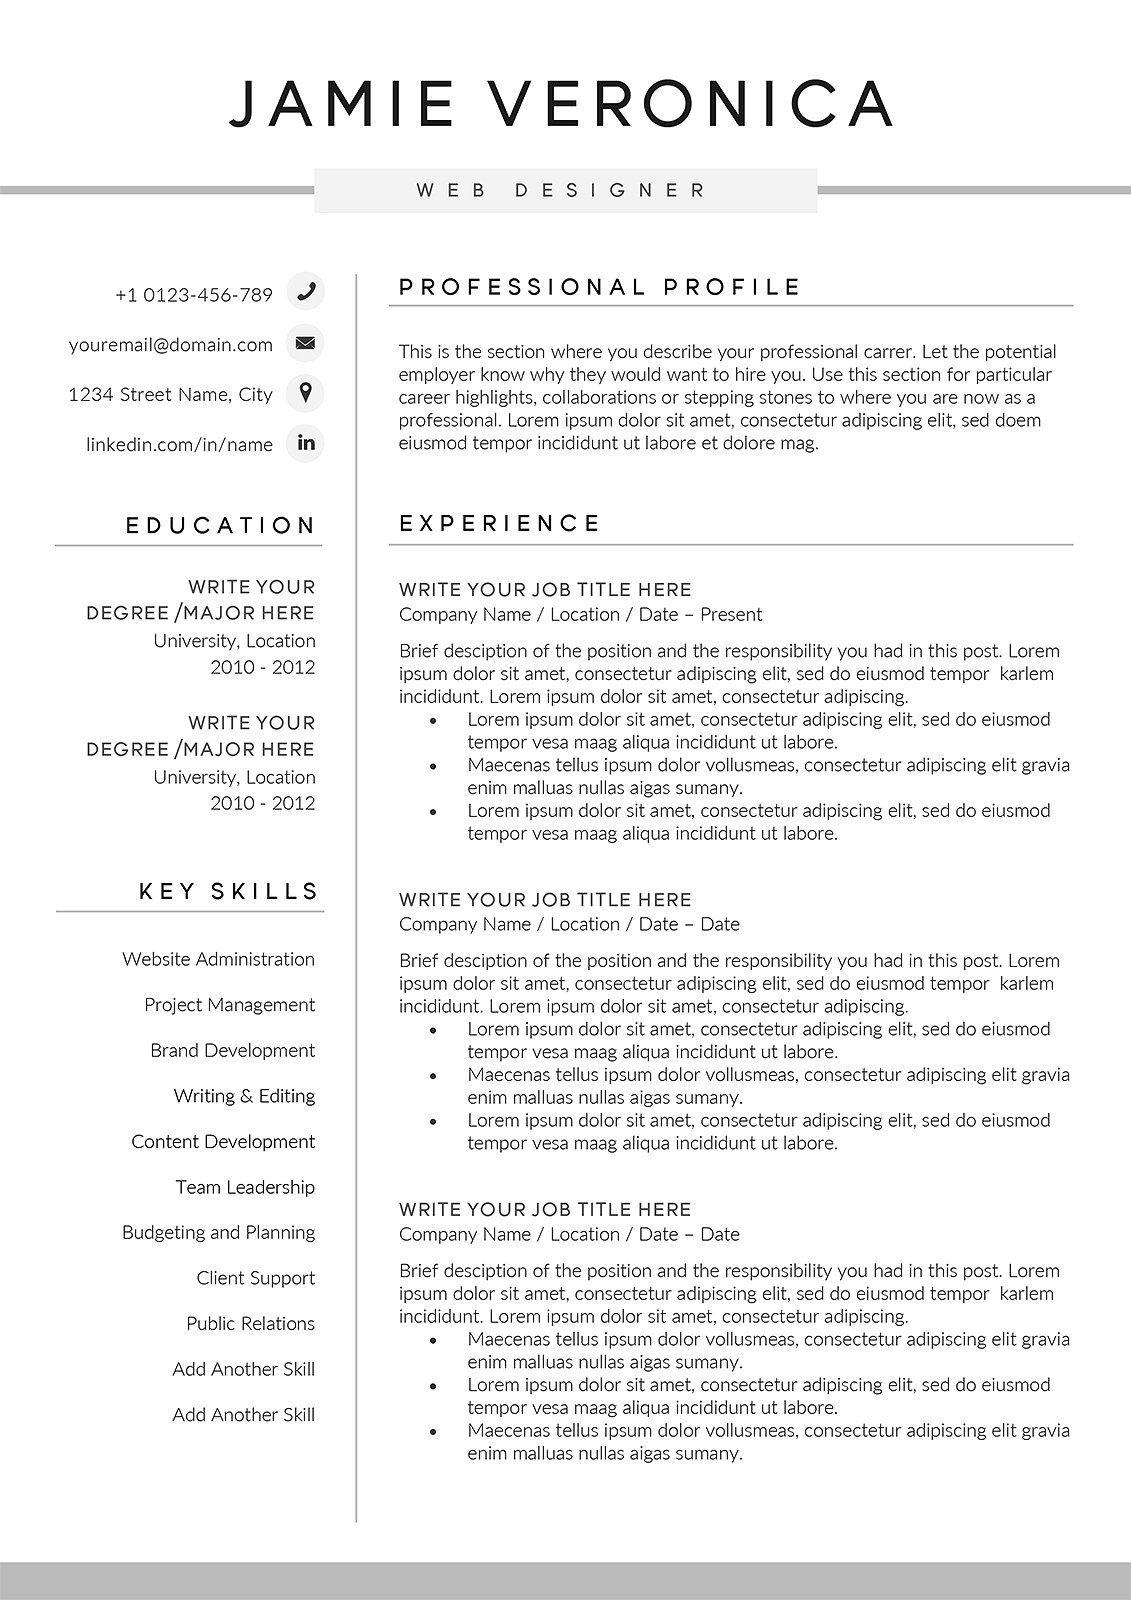 Resume/CV The Jamie Resume cv, Word 2007, Resume